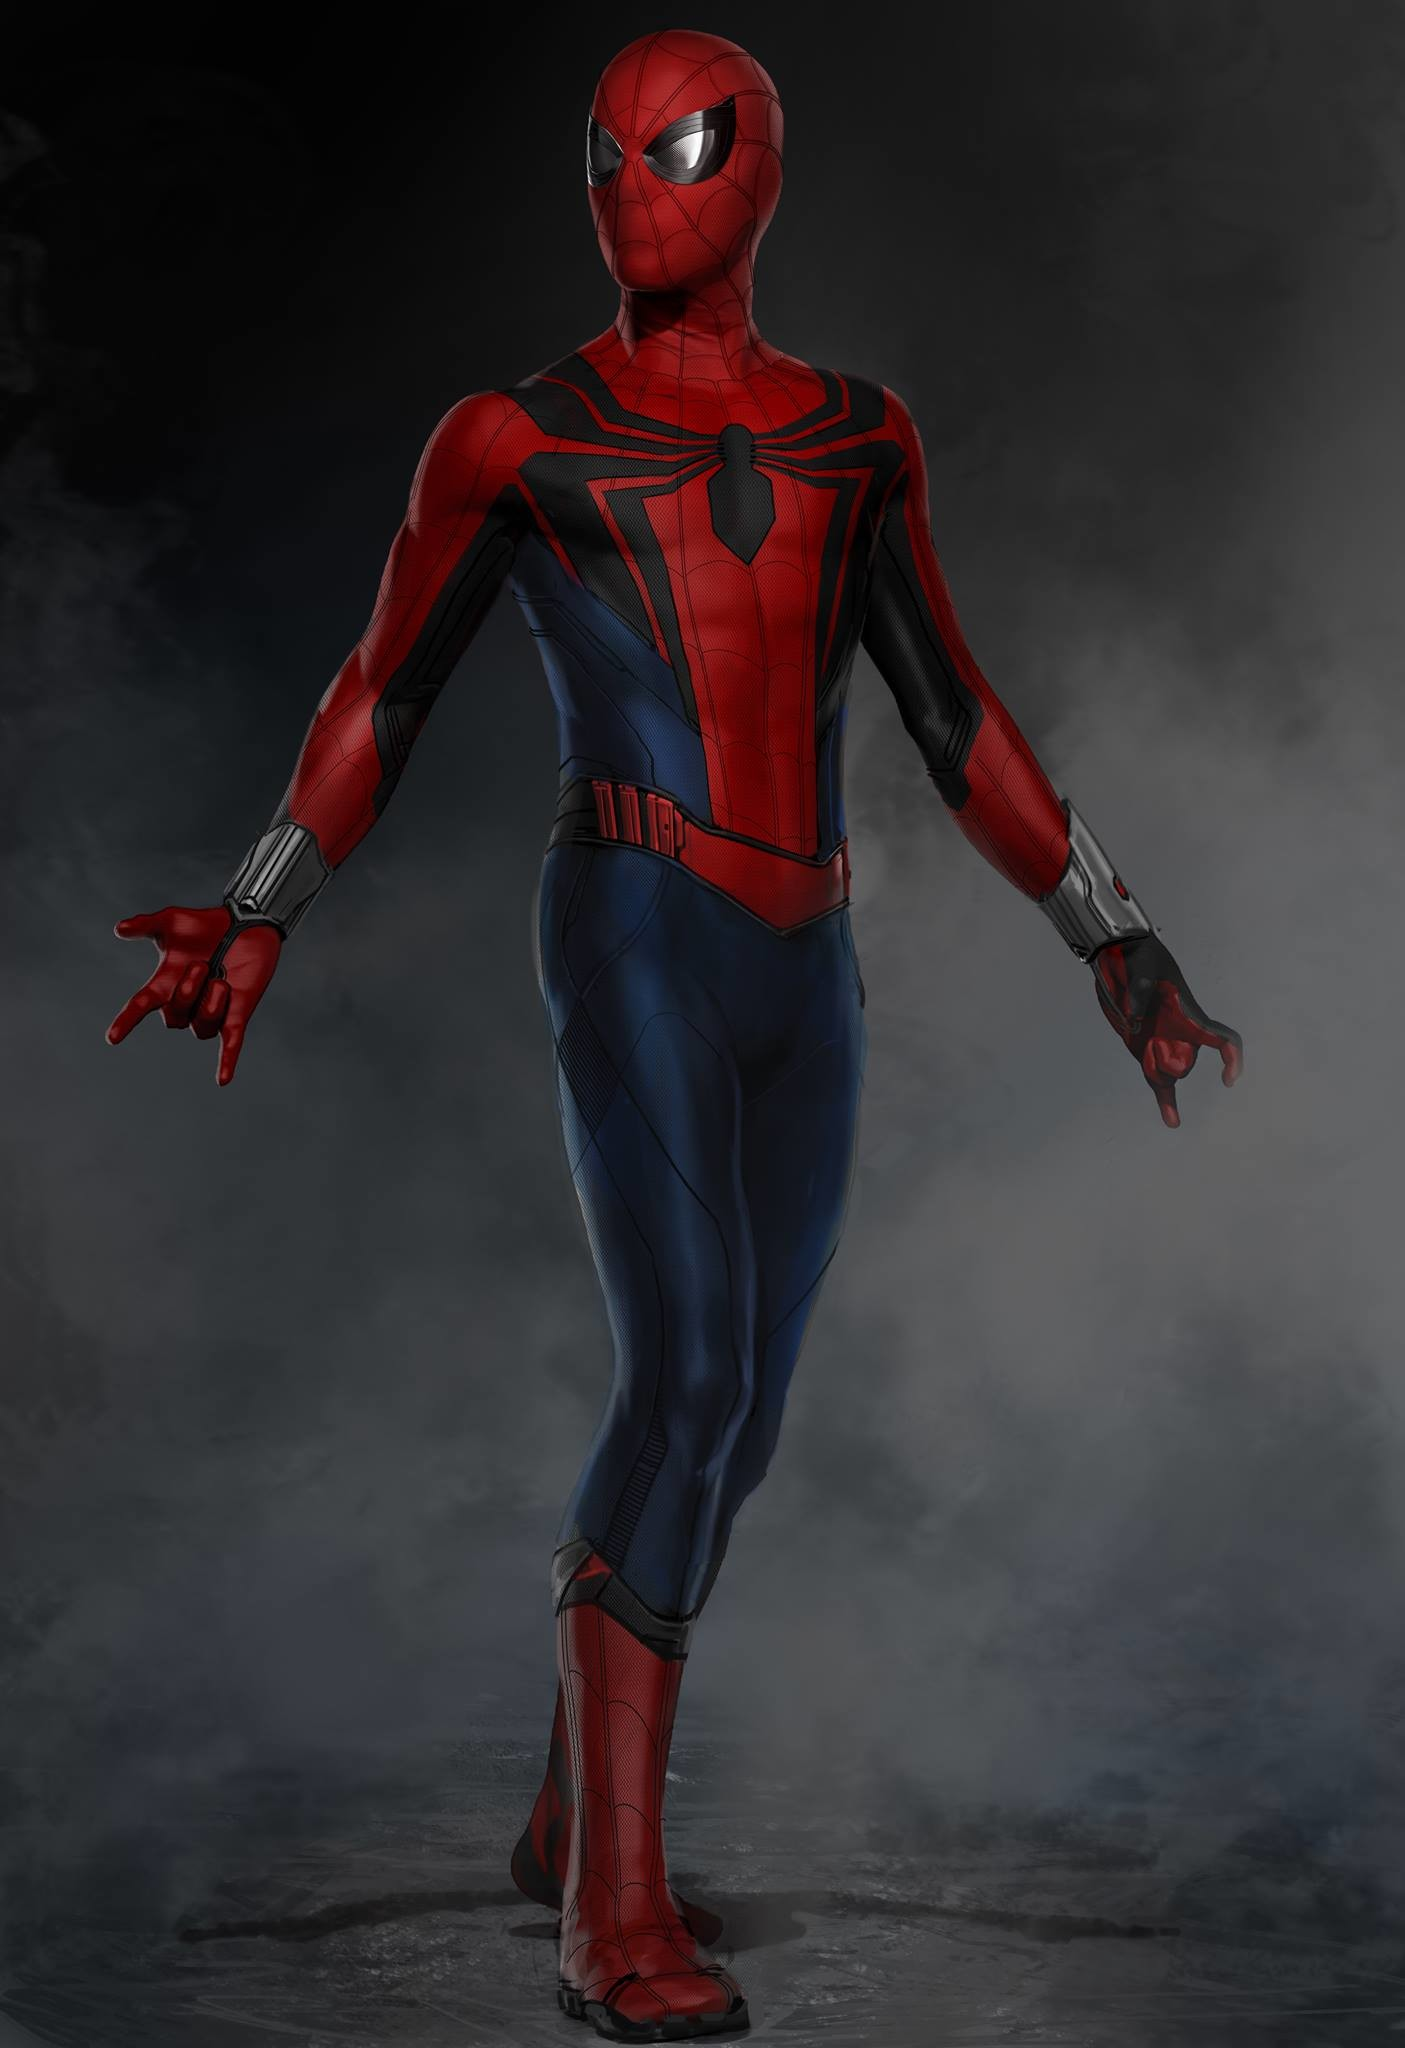 Ryan Meinerding - Design Passes for Spider-Man: Homecoming ...